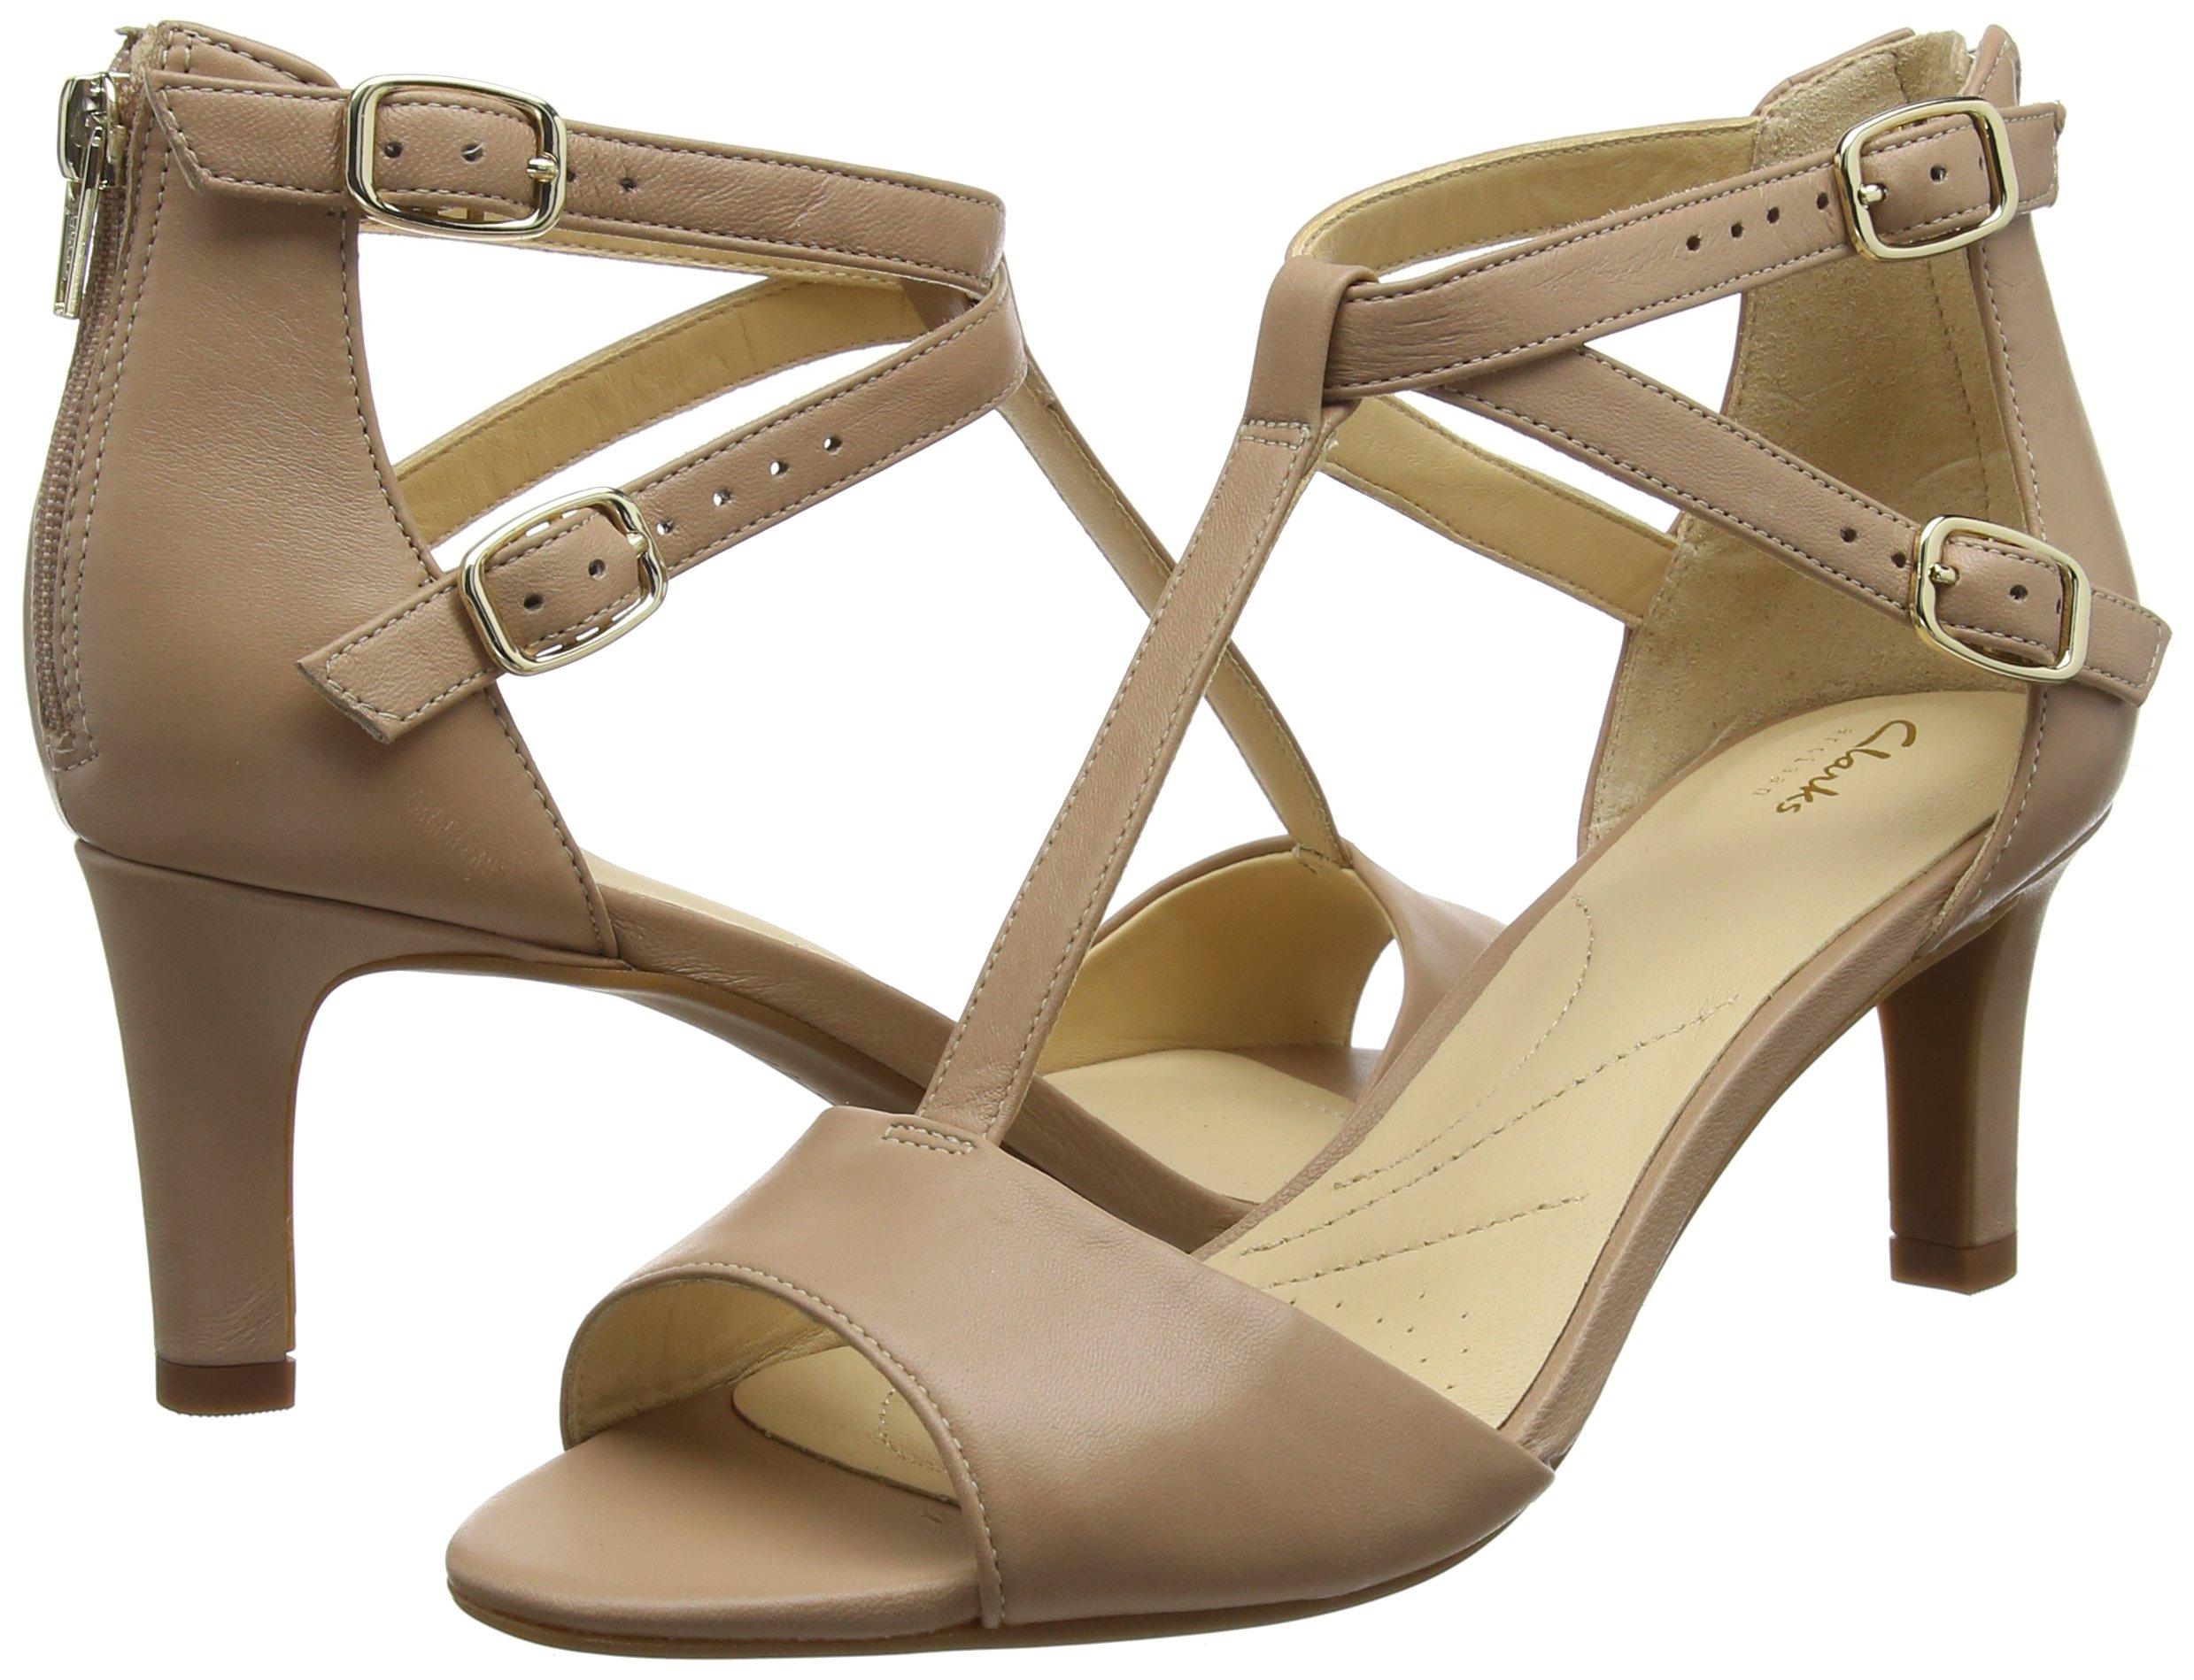 Girar en descubierto recomendar puesto  Clarks Women's Laureti Pearl Ankle Strap Sandals- Buy Online in Antigua and  Barbuda at antigua.desertcart.com. ProductId : 146315623.